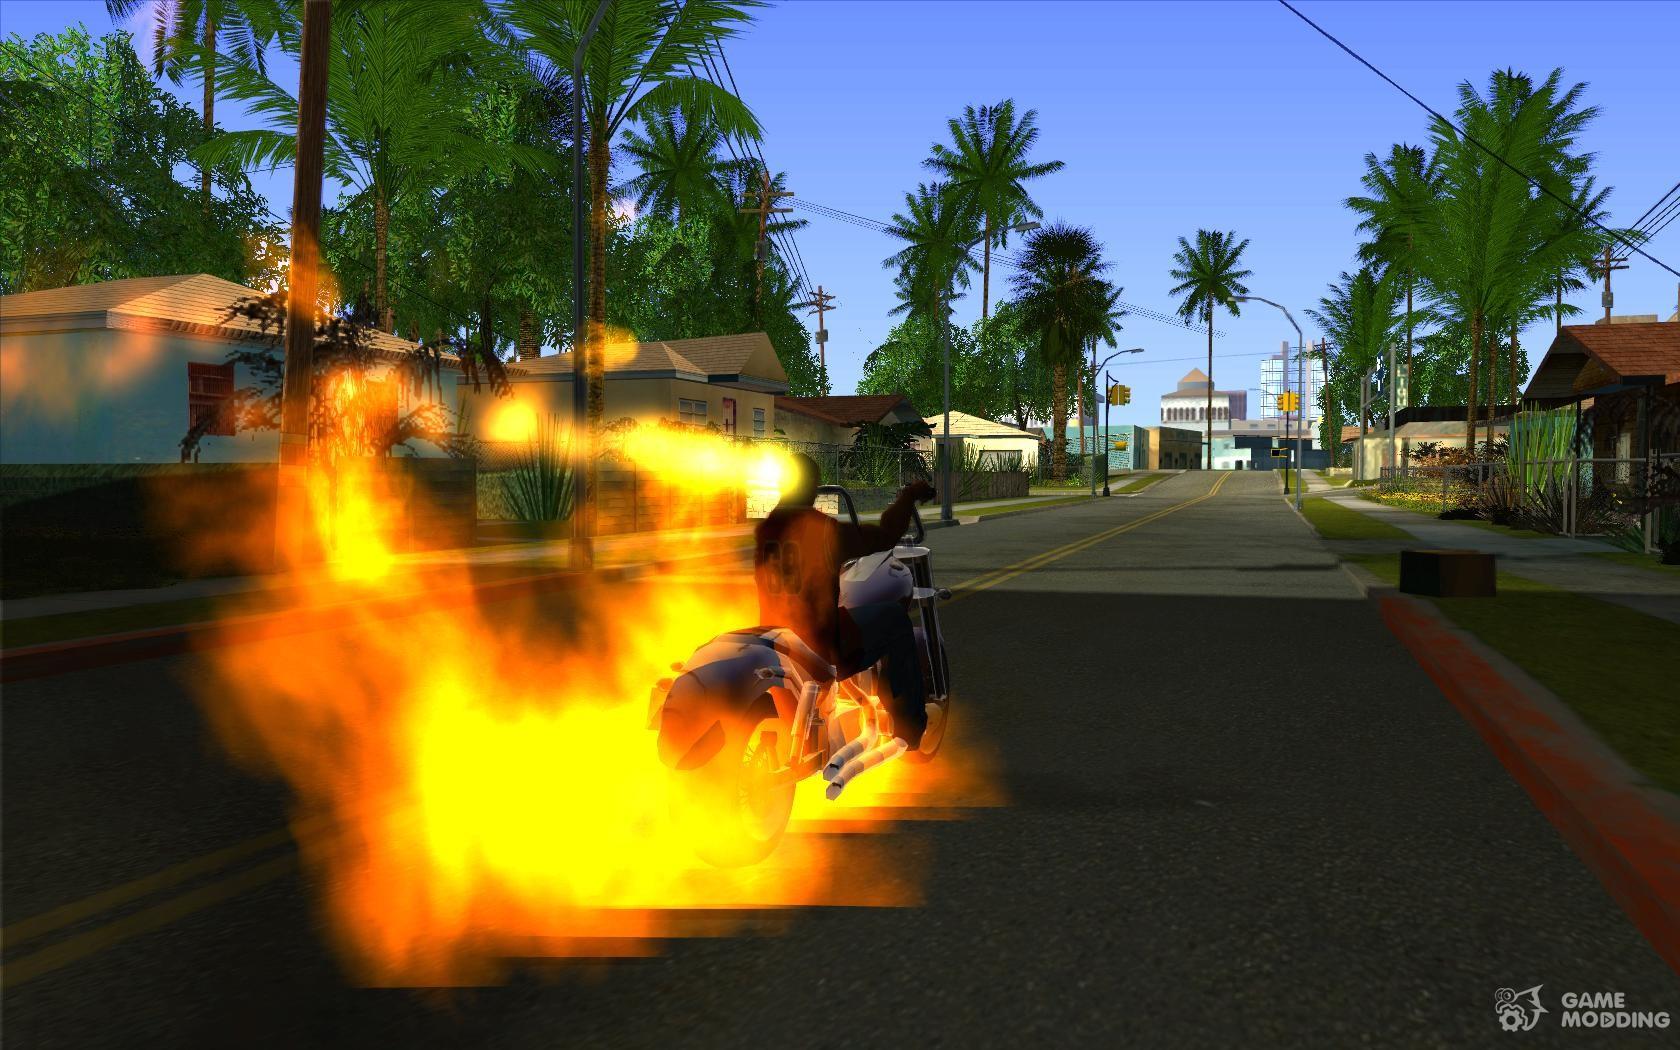 Gta San Andreas Ghost Rider Skin Mod Download - DVD Addict